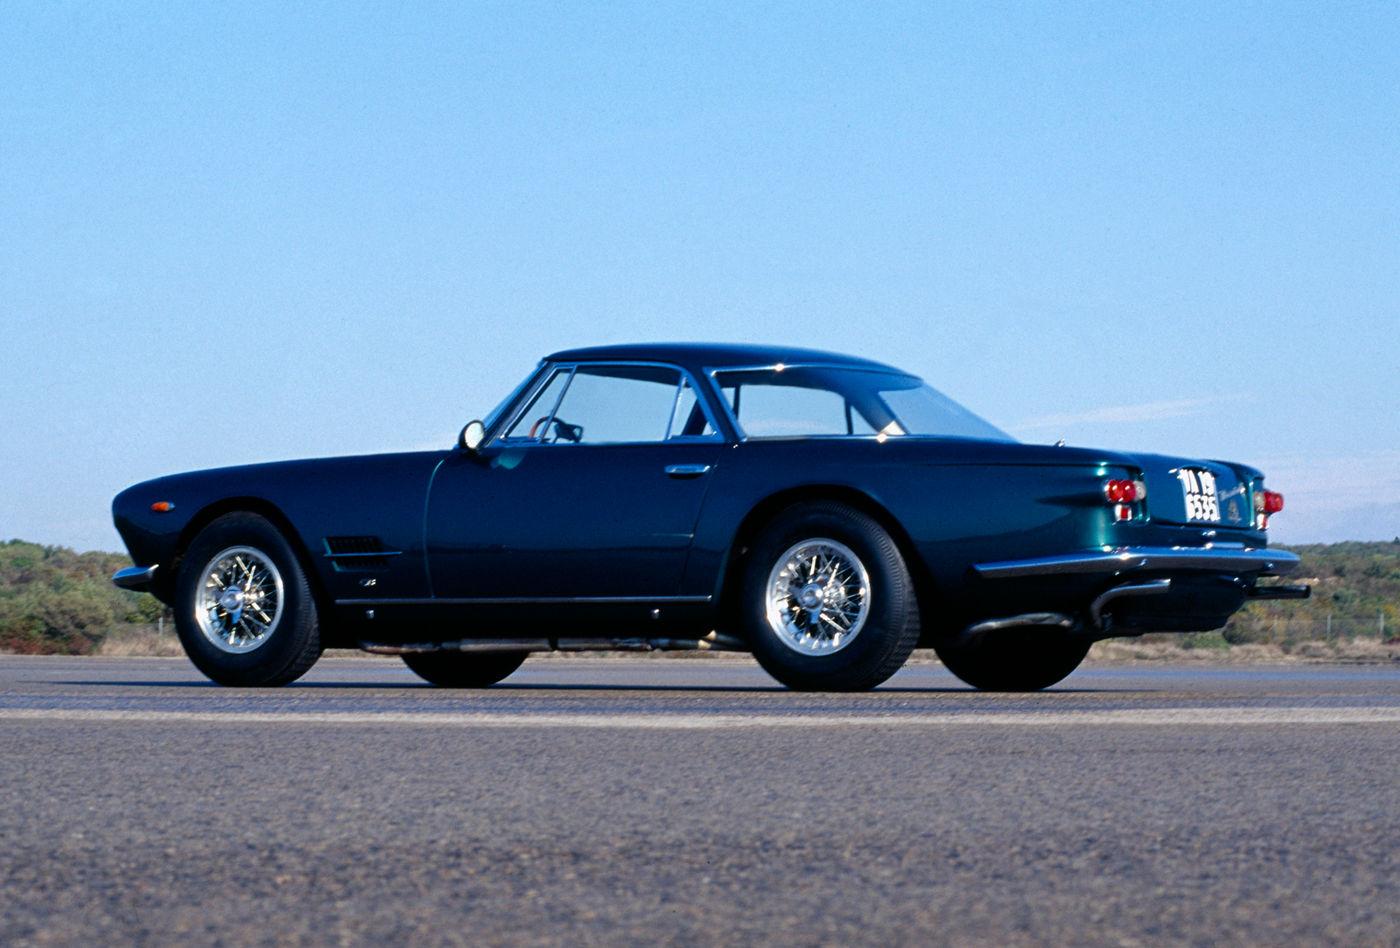 Maserati Classic - GranTurismo 5000 GT - carrosserie bleue - vue profil